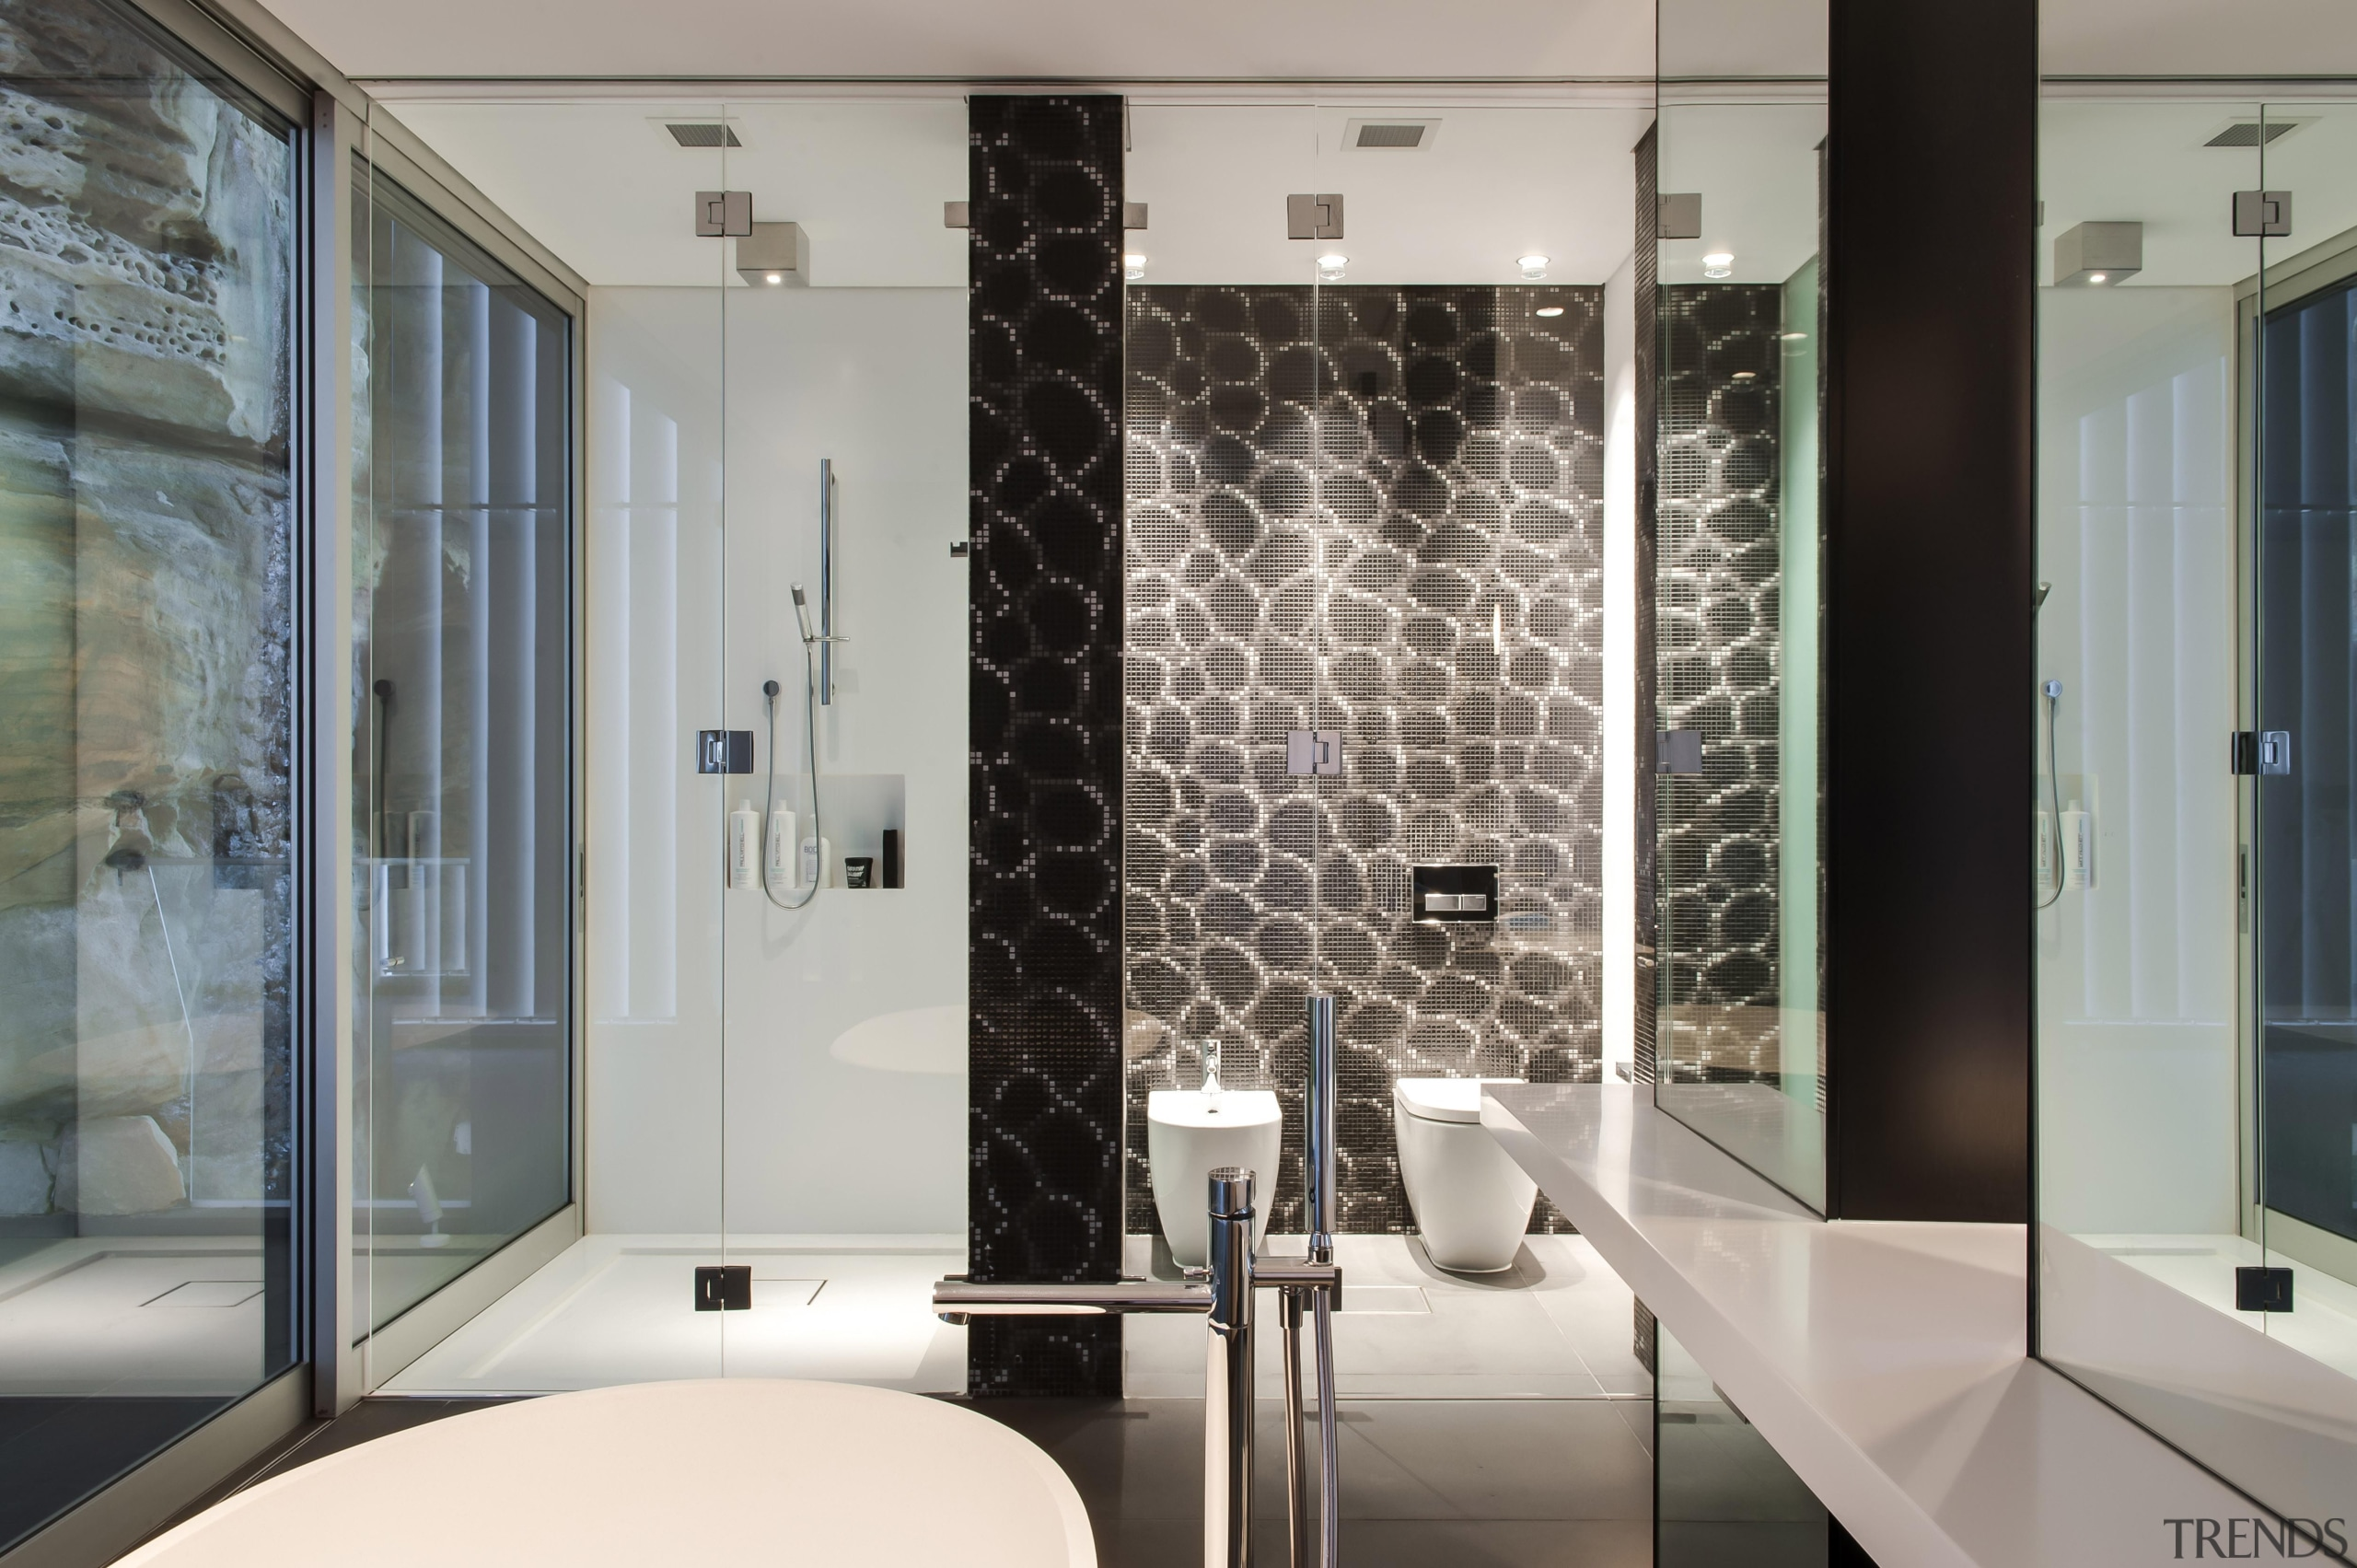 Winner Bathroom Design of the Year 2013 New bathroom, flooring, glass, interior design, wall, window, gray